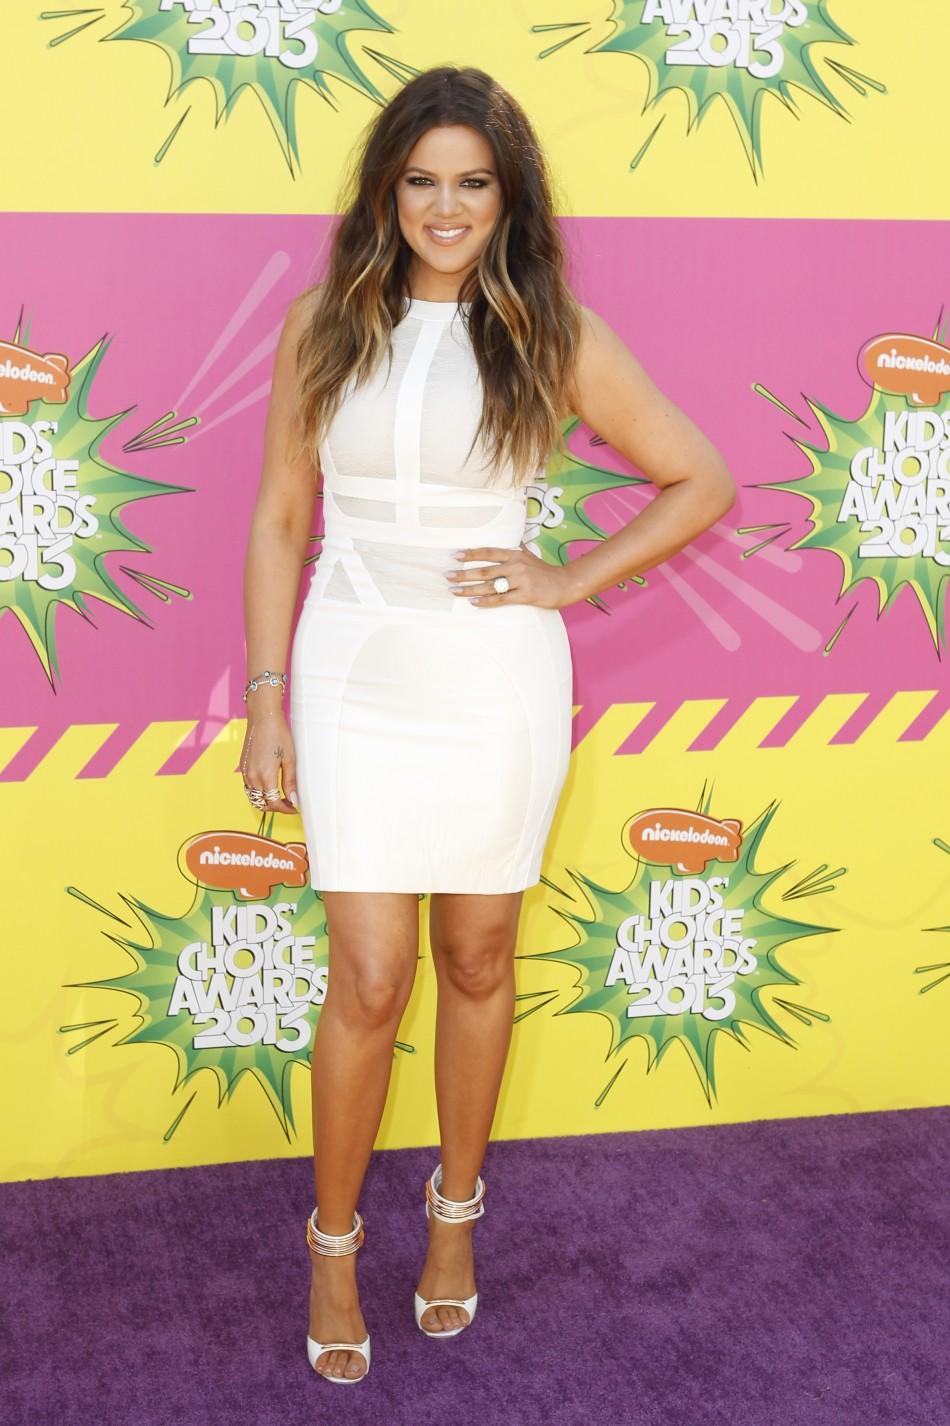 Actress Khloe Kardashian arrives at the 2013 Kids Choice Awards